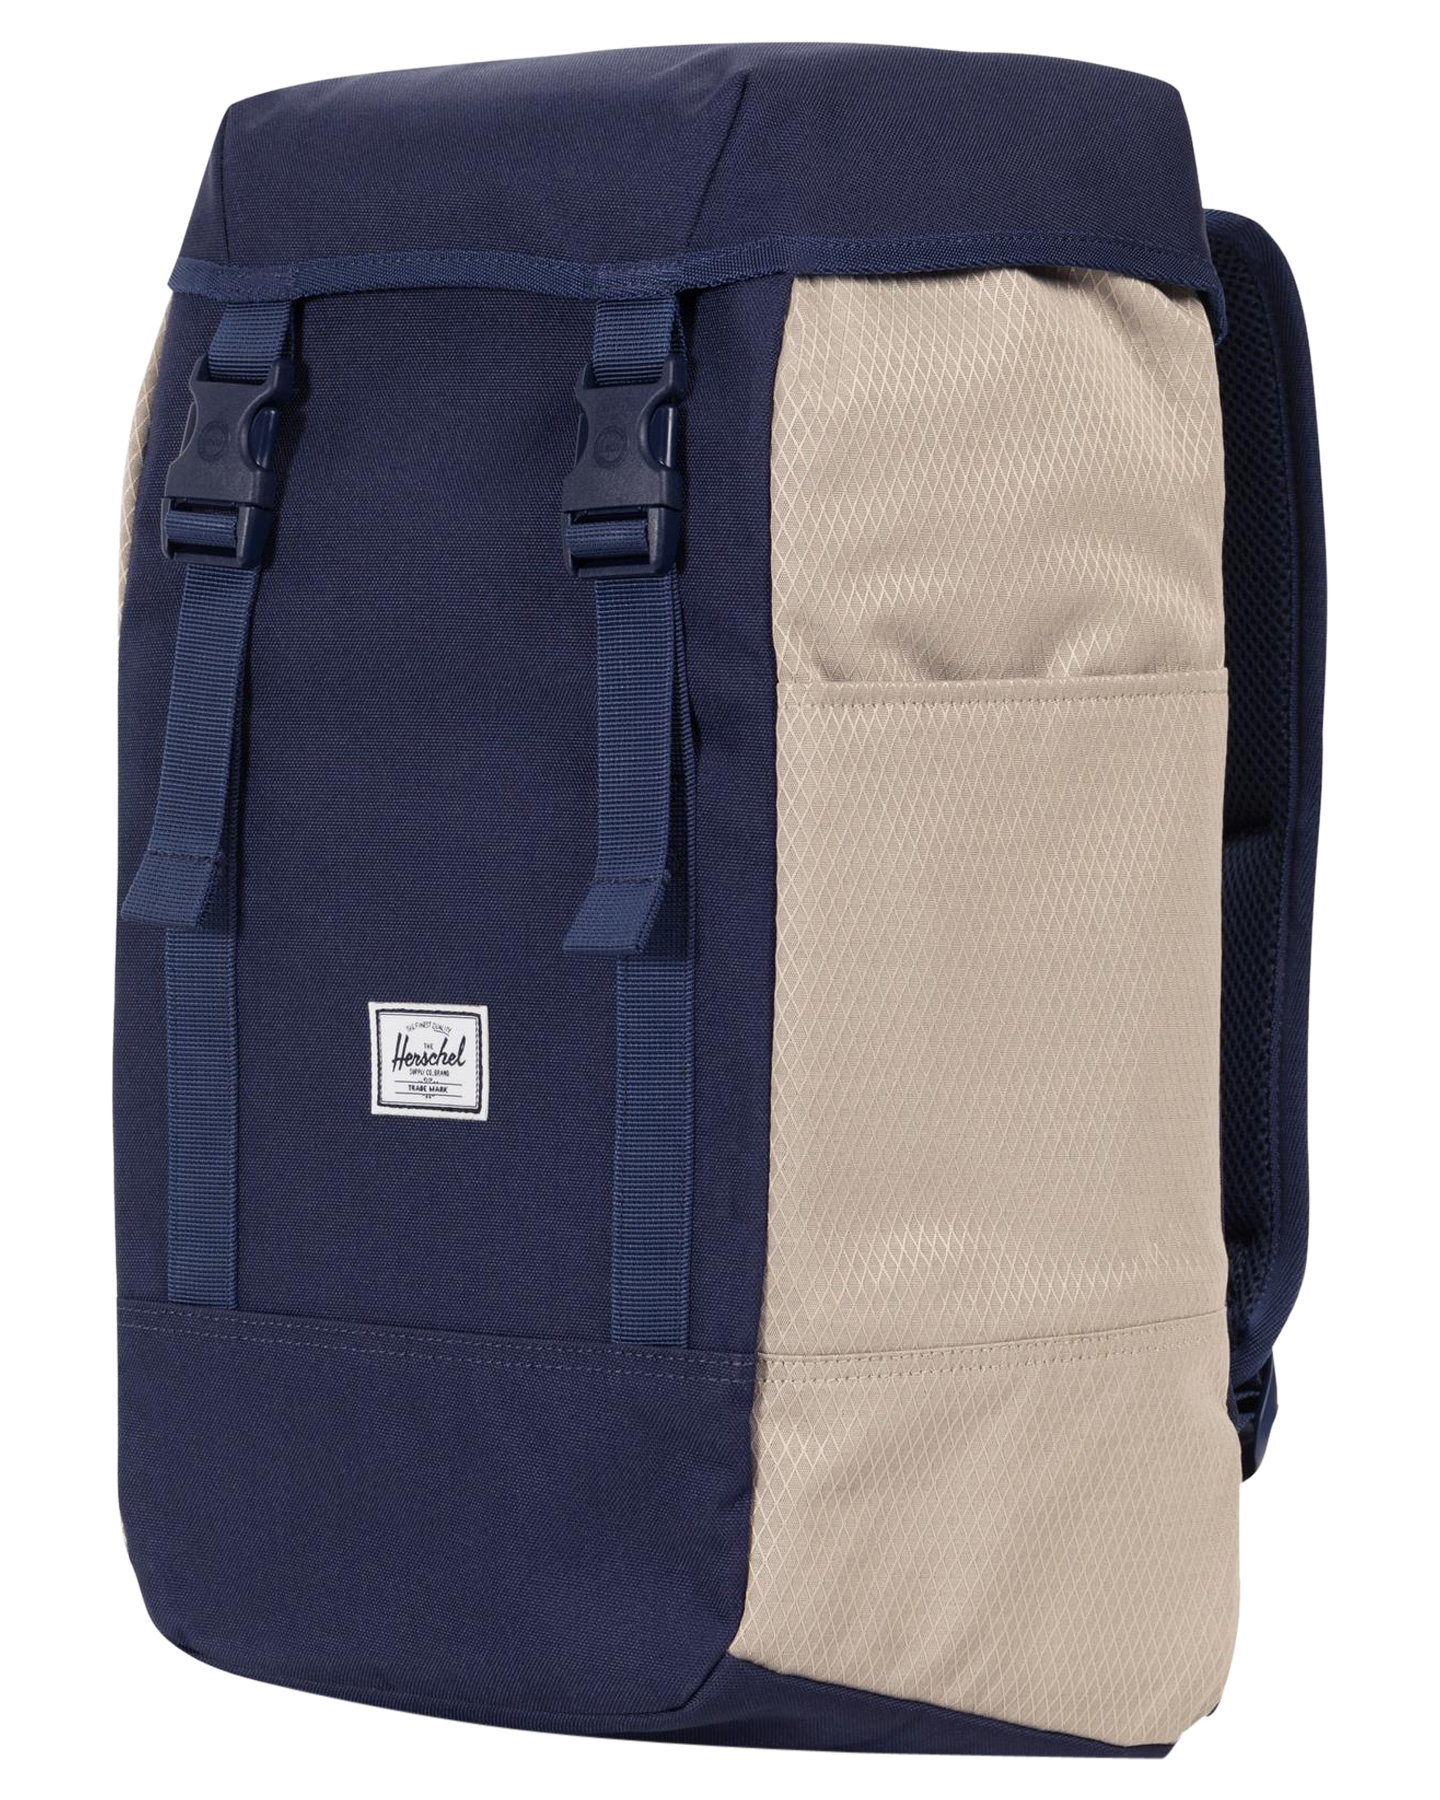 New Herschel Supply Co Men s Iona 24L Backpack Nylon Blue N A ... ab9c18b69d769